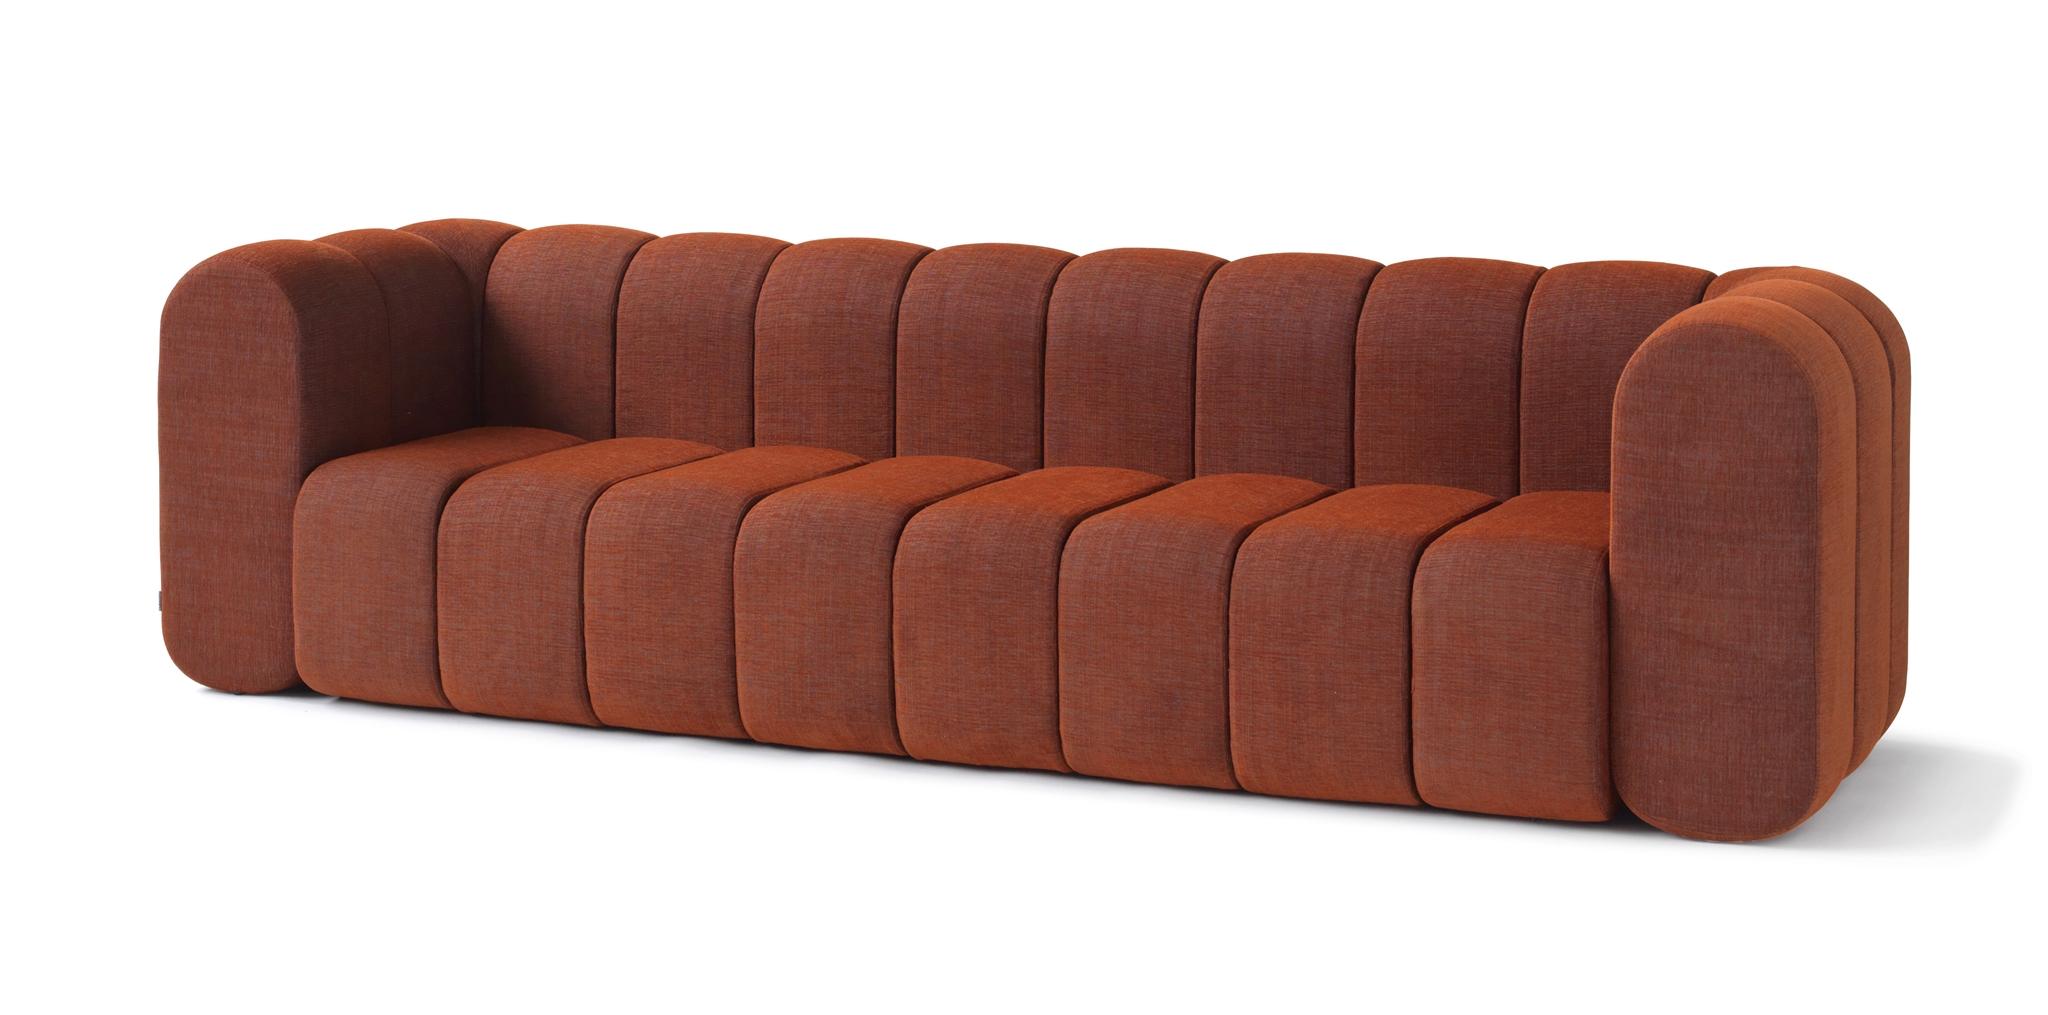 Bob sofa bob sofa christophe delcourt furniture pinterest for Sofa 70 cm deep